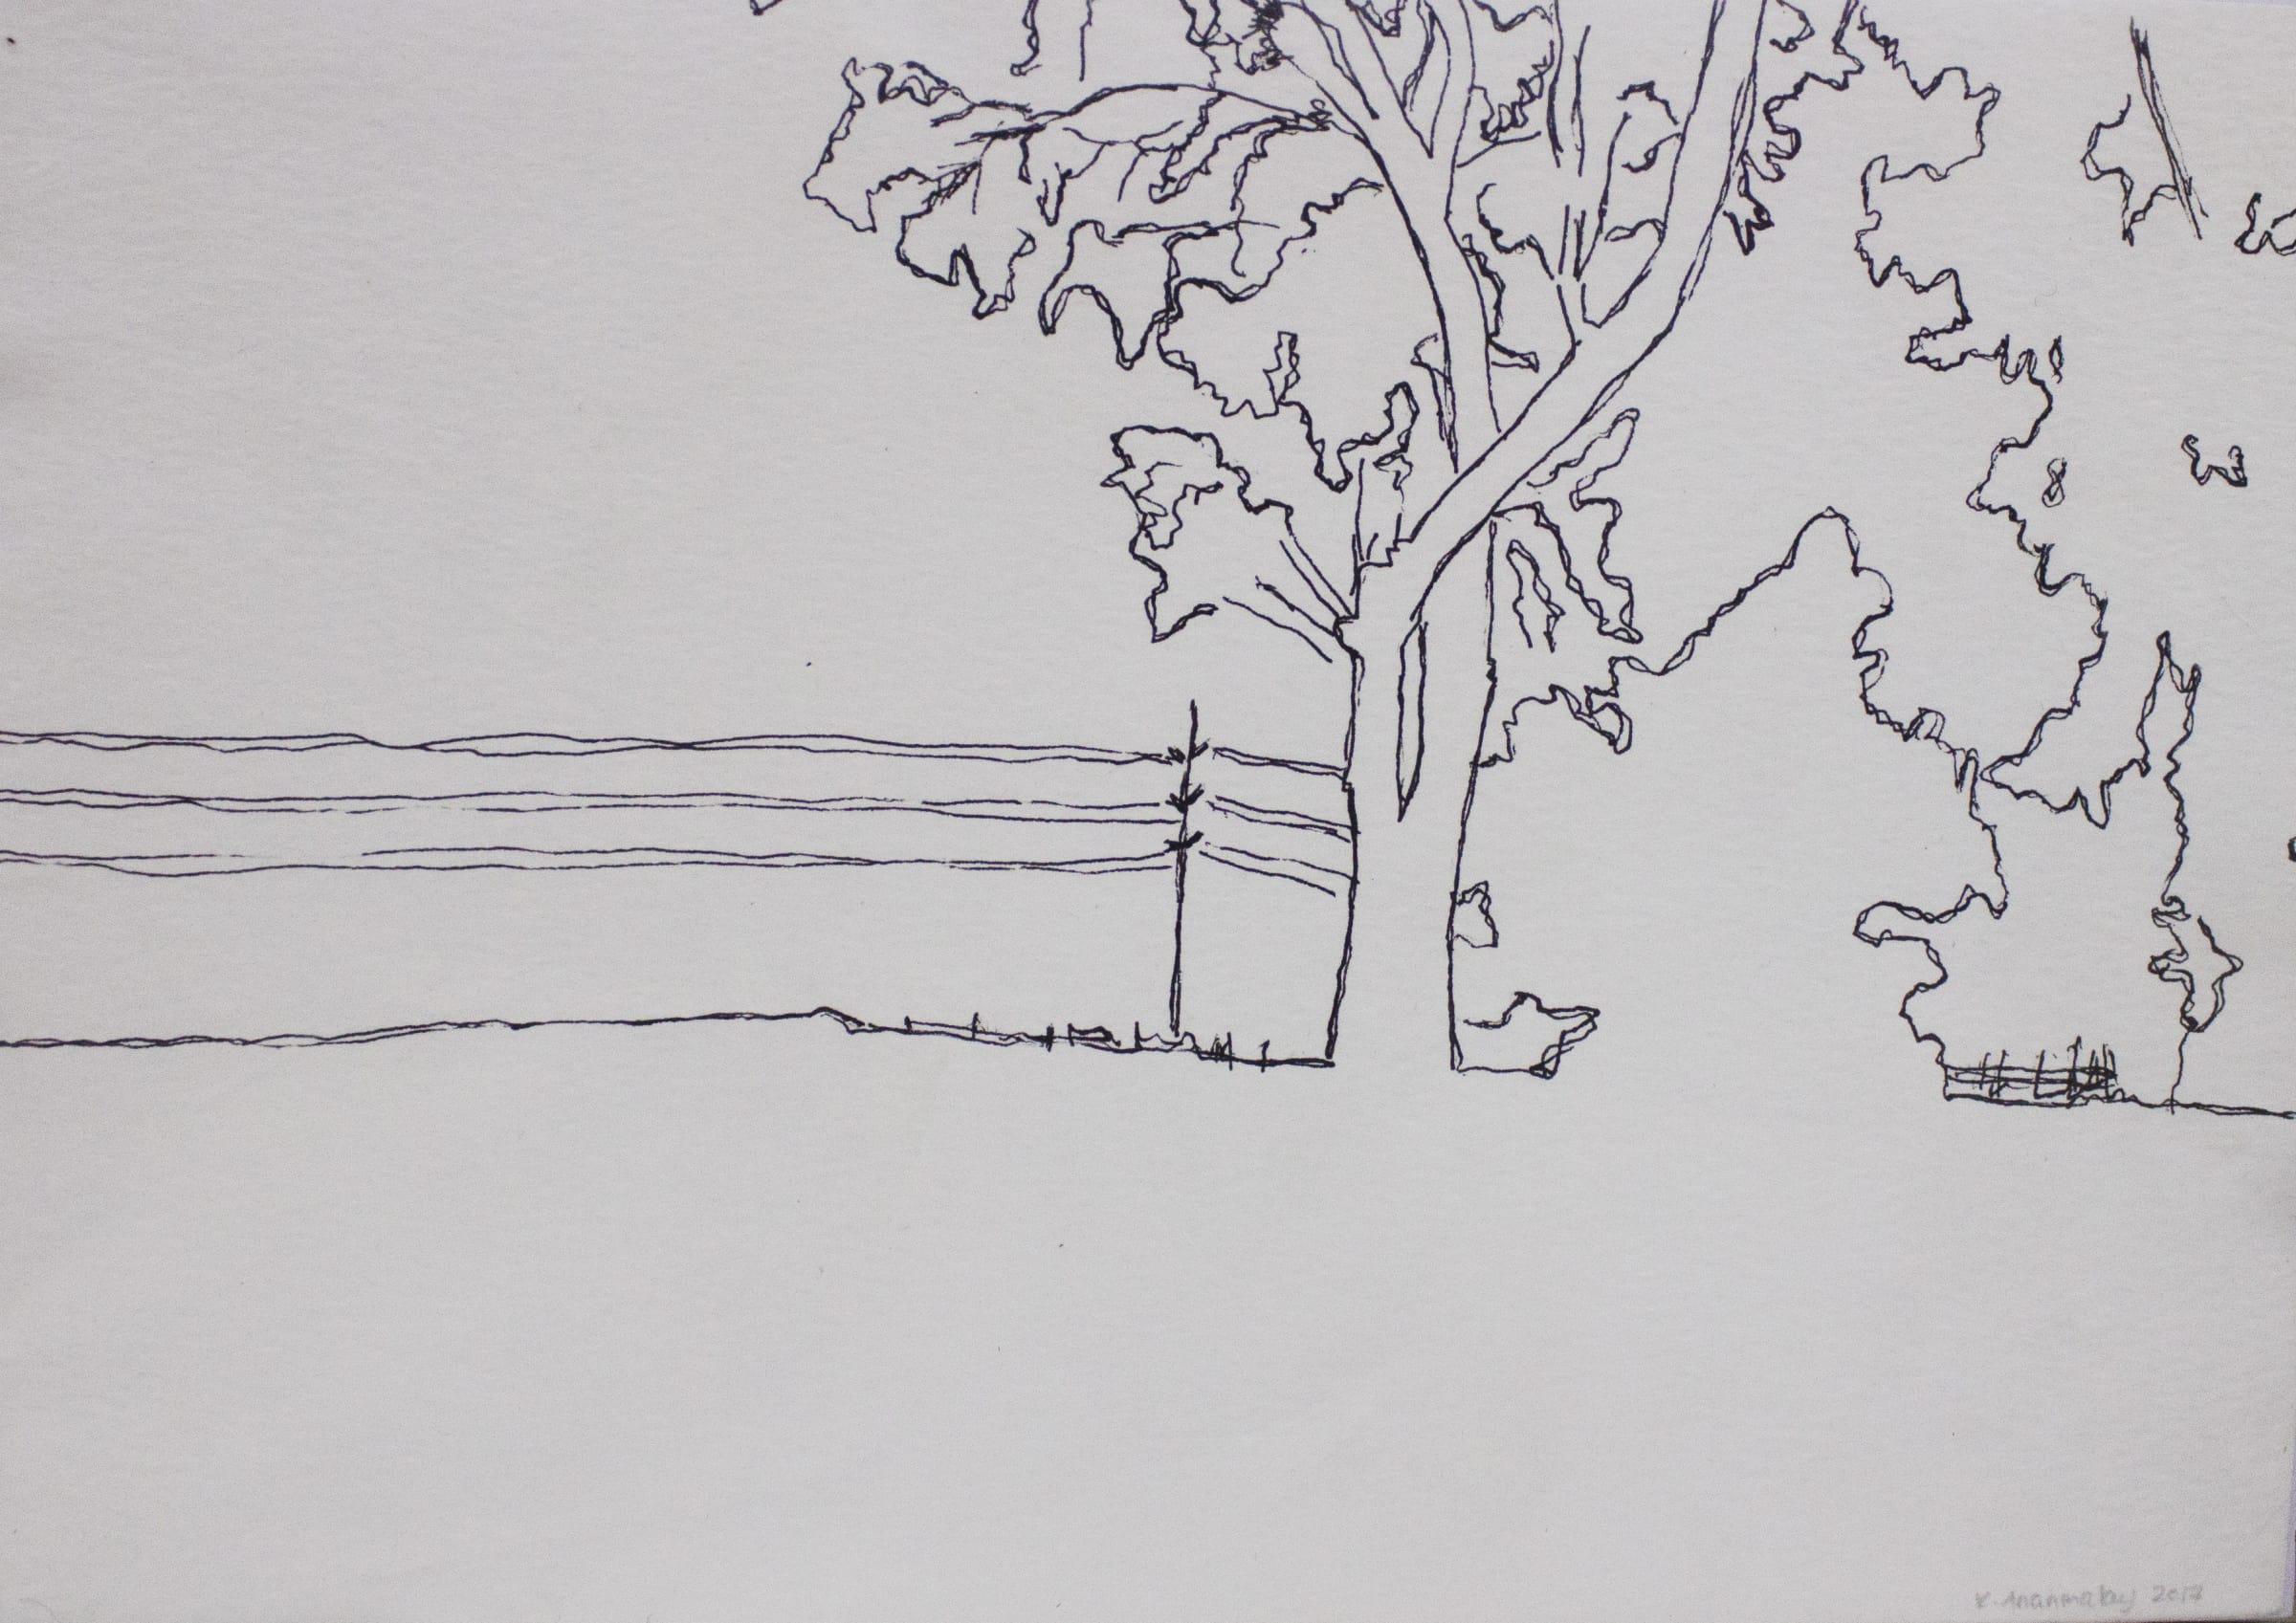 <span class=&#34;link fancybox-details-link&#34;><a href=&#34;/content/viewing-room/50/artworks2566/&#34;>View Detail Page</a></span><div class=&#34;medium&#34;>Ink On Watercolour Paper</div> <div class=&#34;dimensions&#34;>14.8cm x 21cm</div>